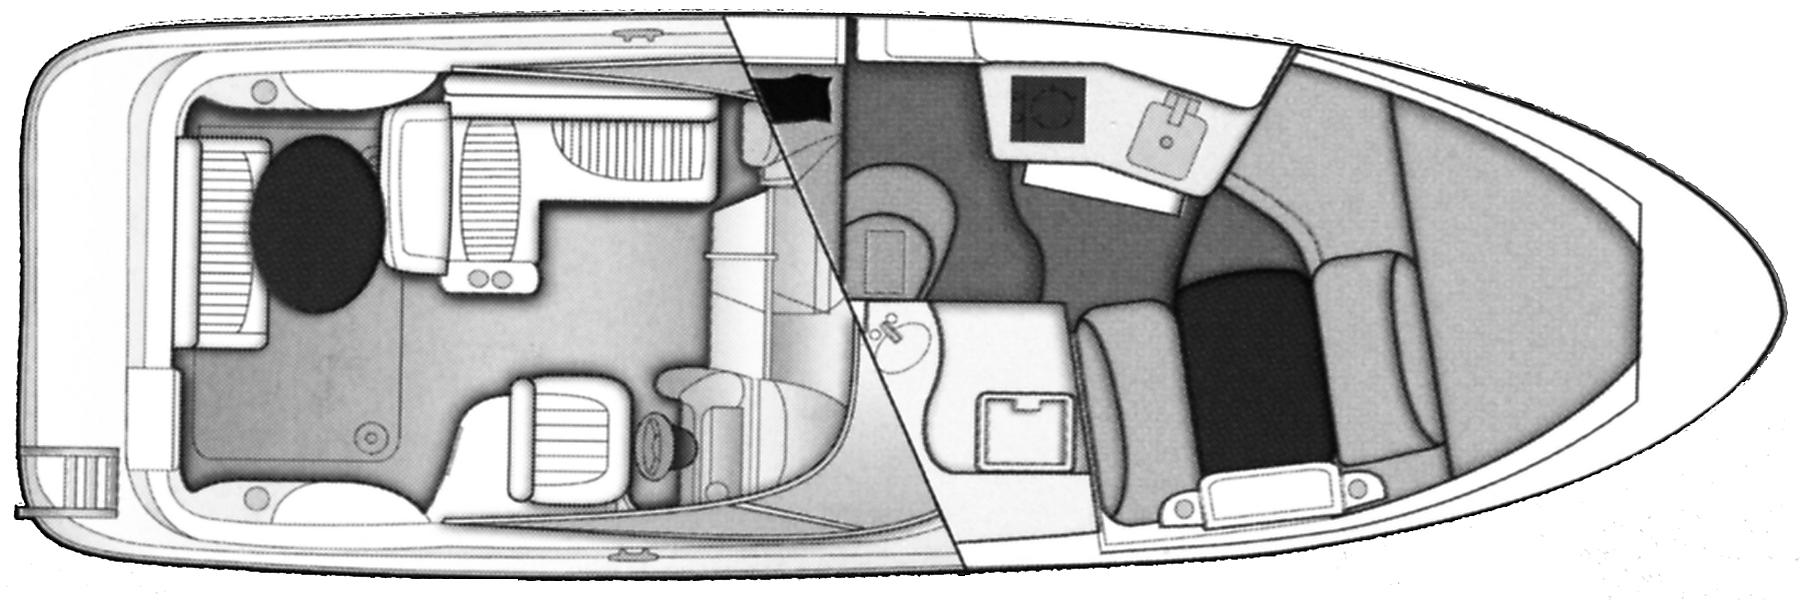 275 SB Cruiser Floor Plan 1